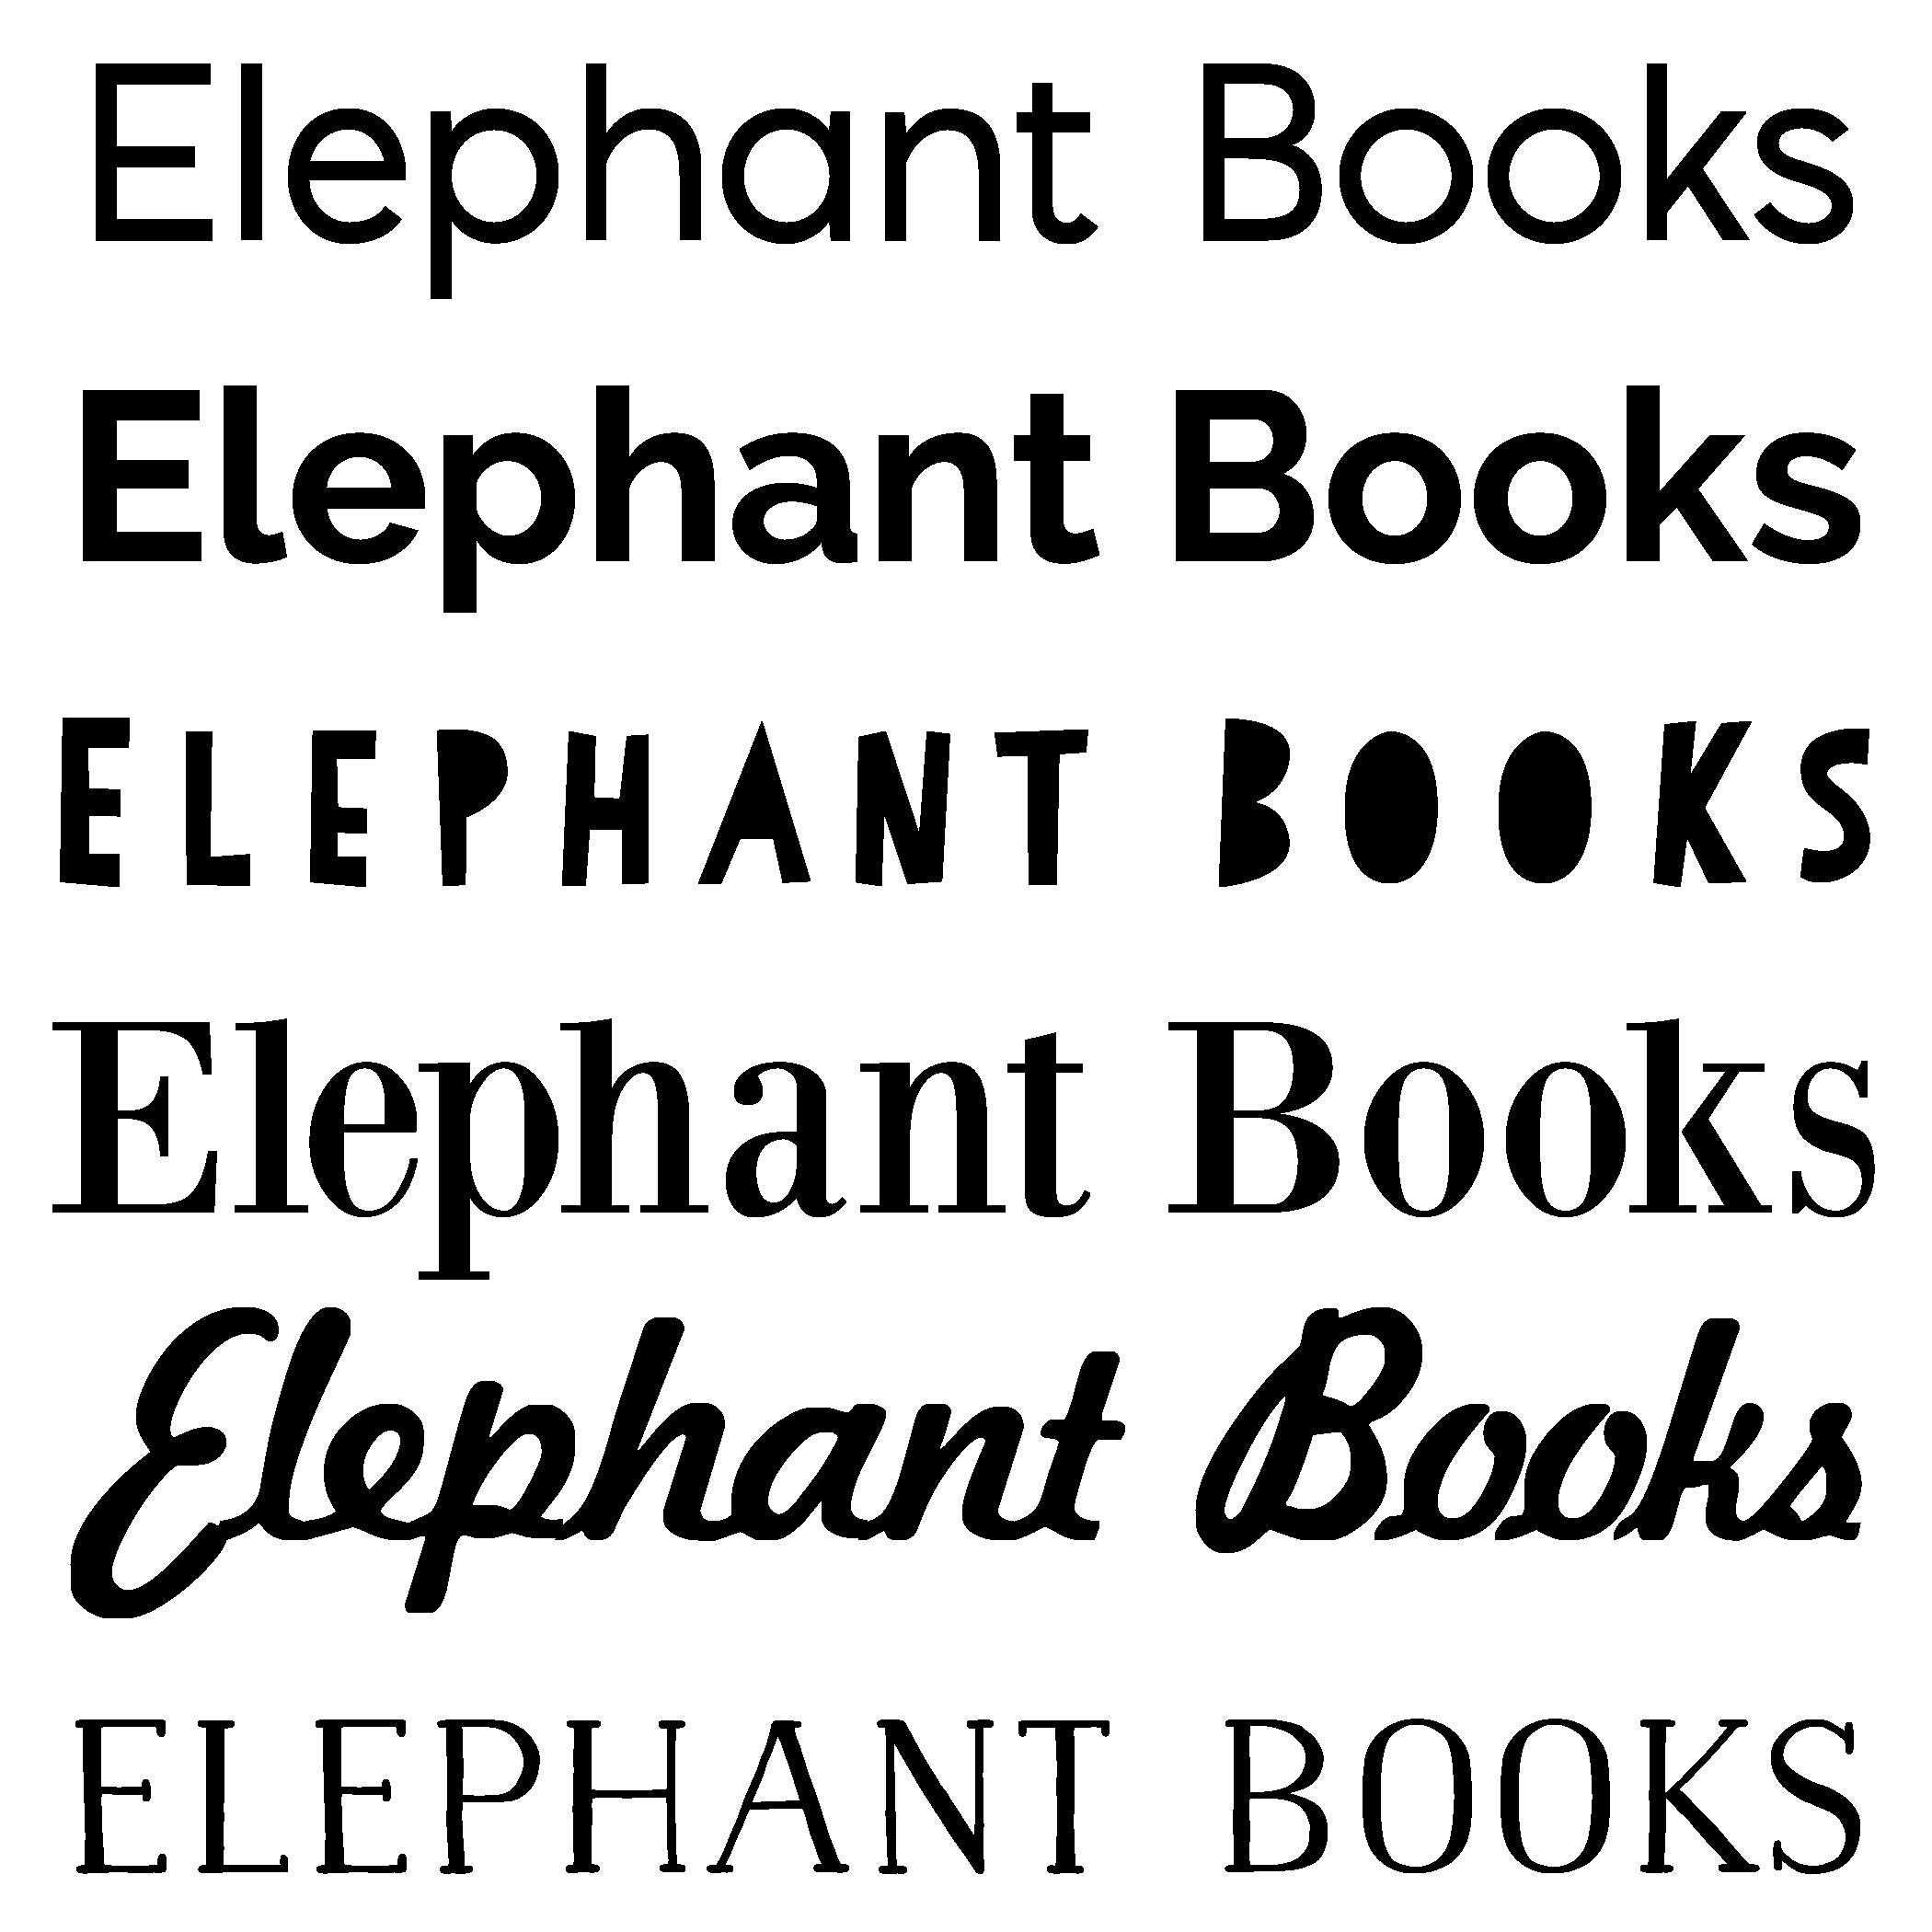 ElephantBooks_Type_Preliminary-01.png